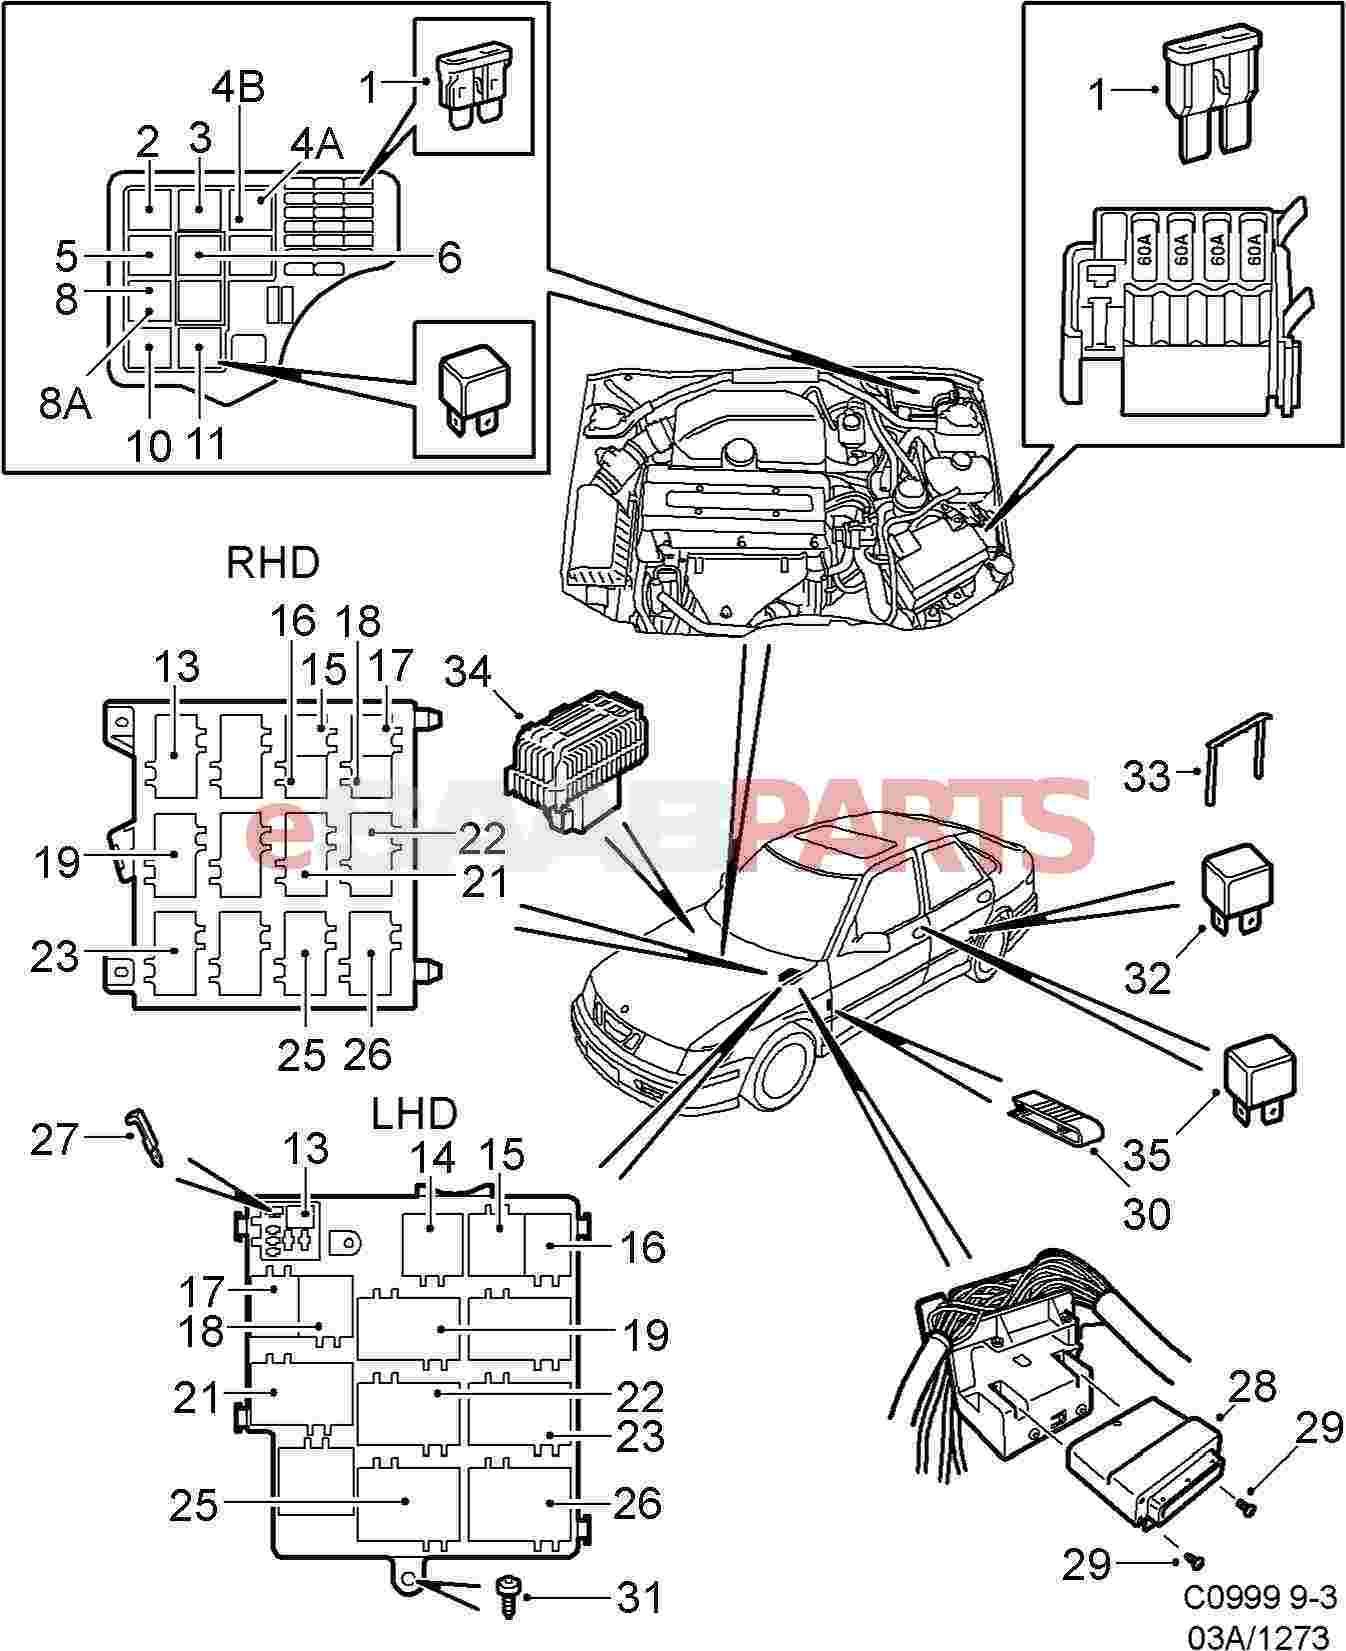 HZZP_8087 1997 Saab 9000 Cs Relay Diagram Relay Diagram ...